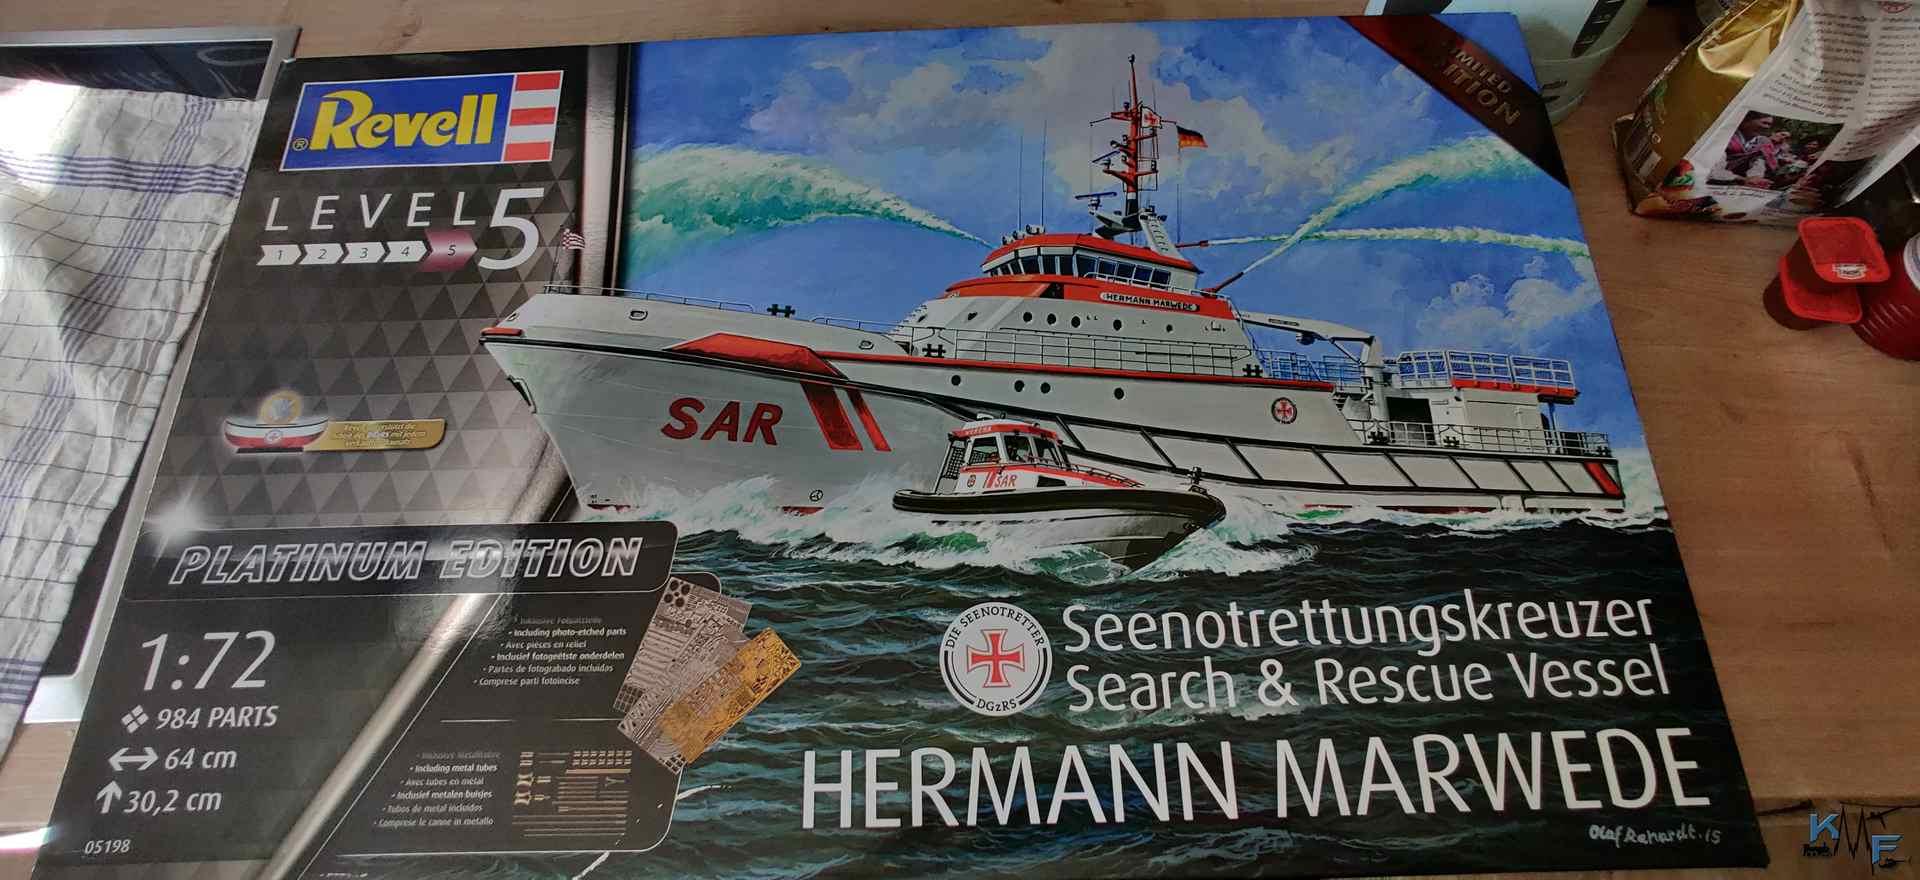 BV-REV-SAR-HERMANN_MARWEDE_01.jpg